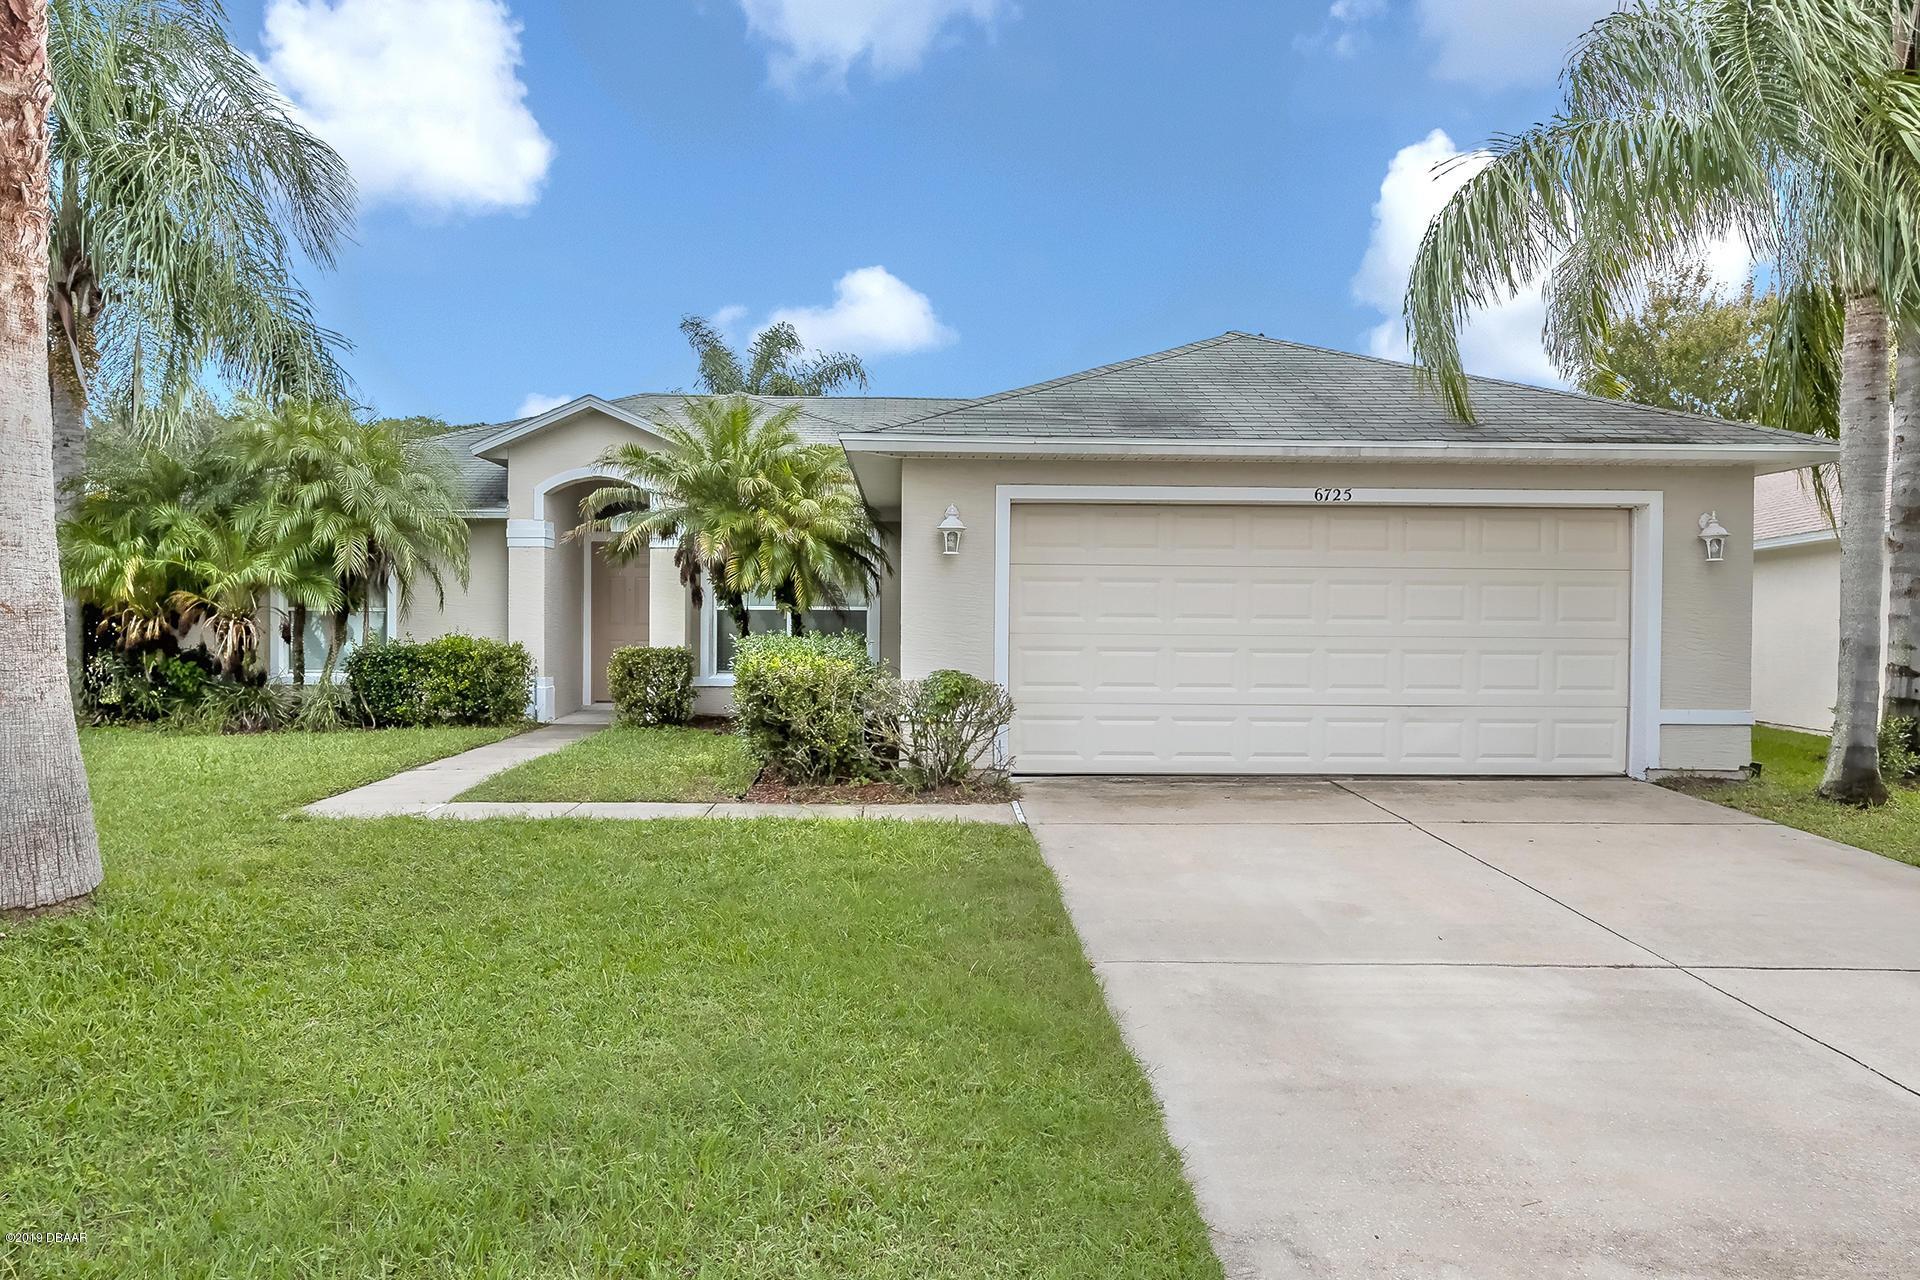 Photo of 6725 Calistoga Circle, Port Orange, FL 32128